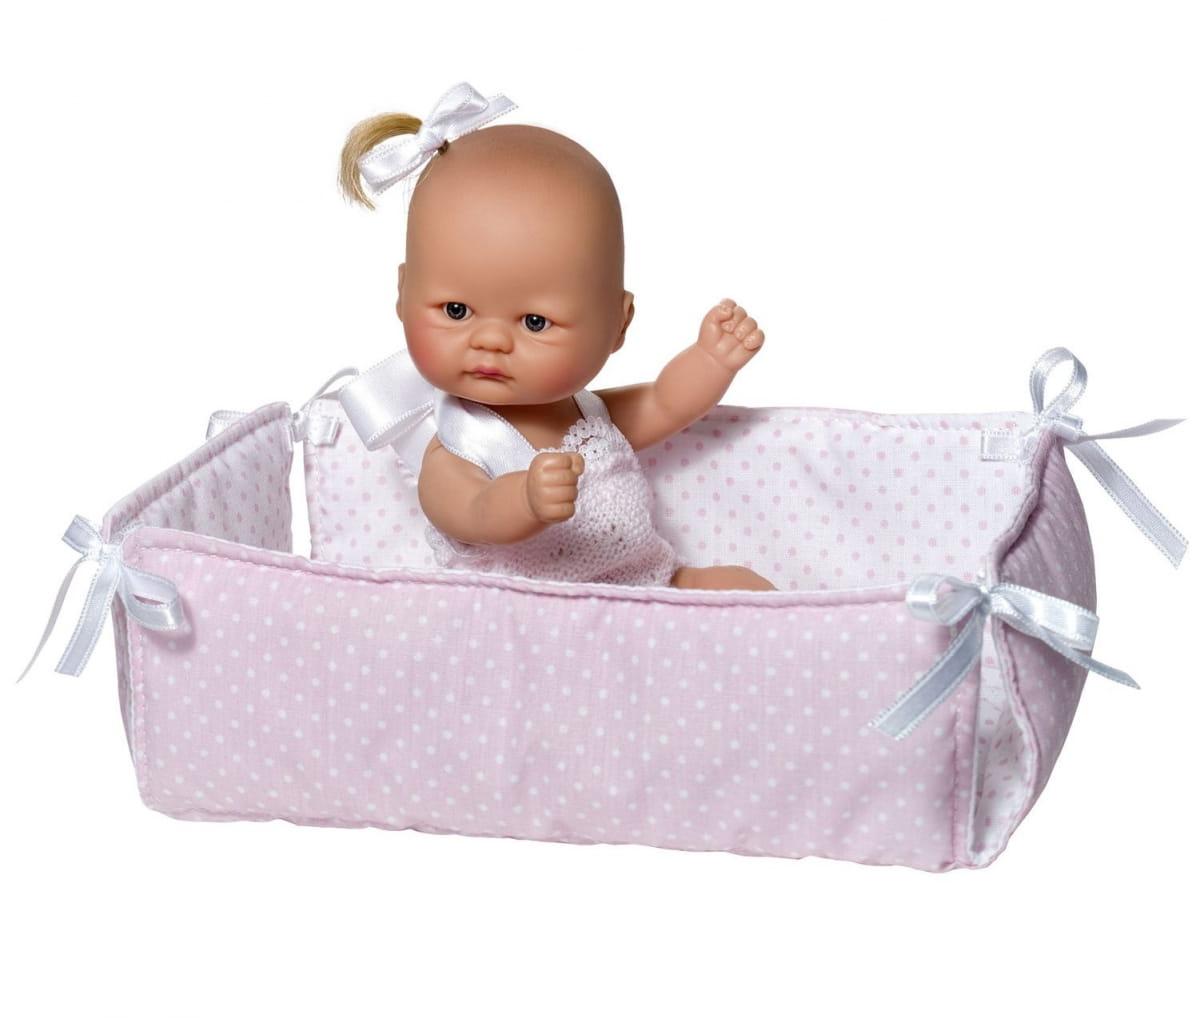 Кукла-пупс ASI - 20 см (розовый манеж)